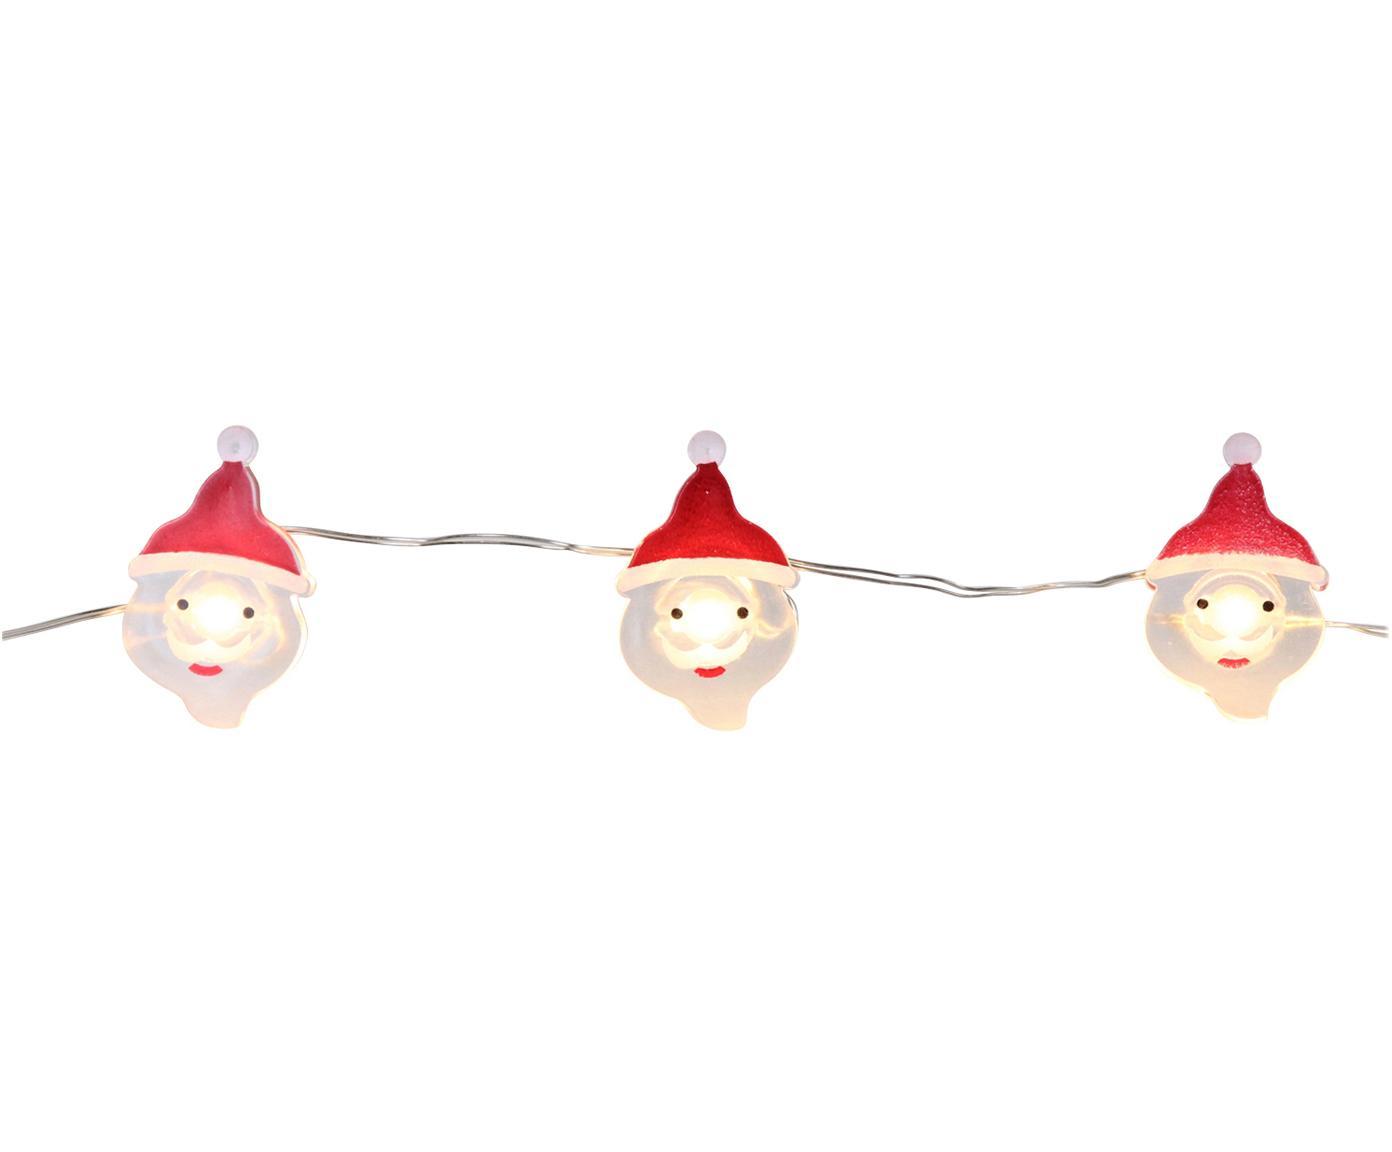 LED Lichterkette Santa Claus, Metalldraht, Acrylglas, Metall, Kunststoff, Weiß, Rot, L 220 cm